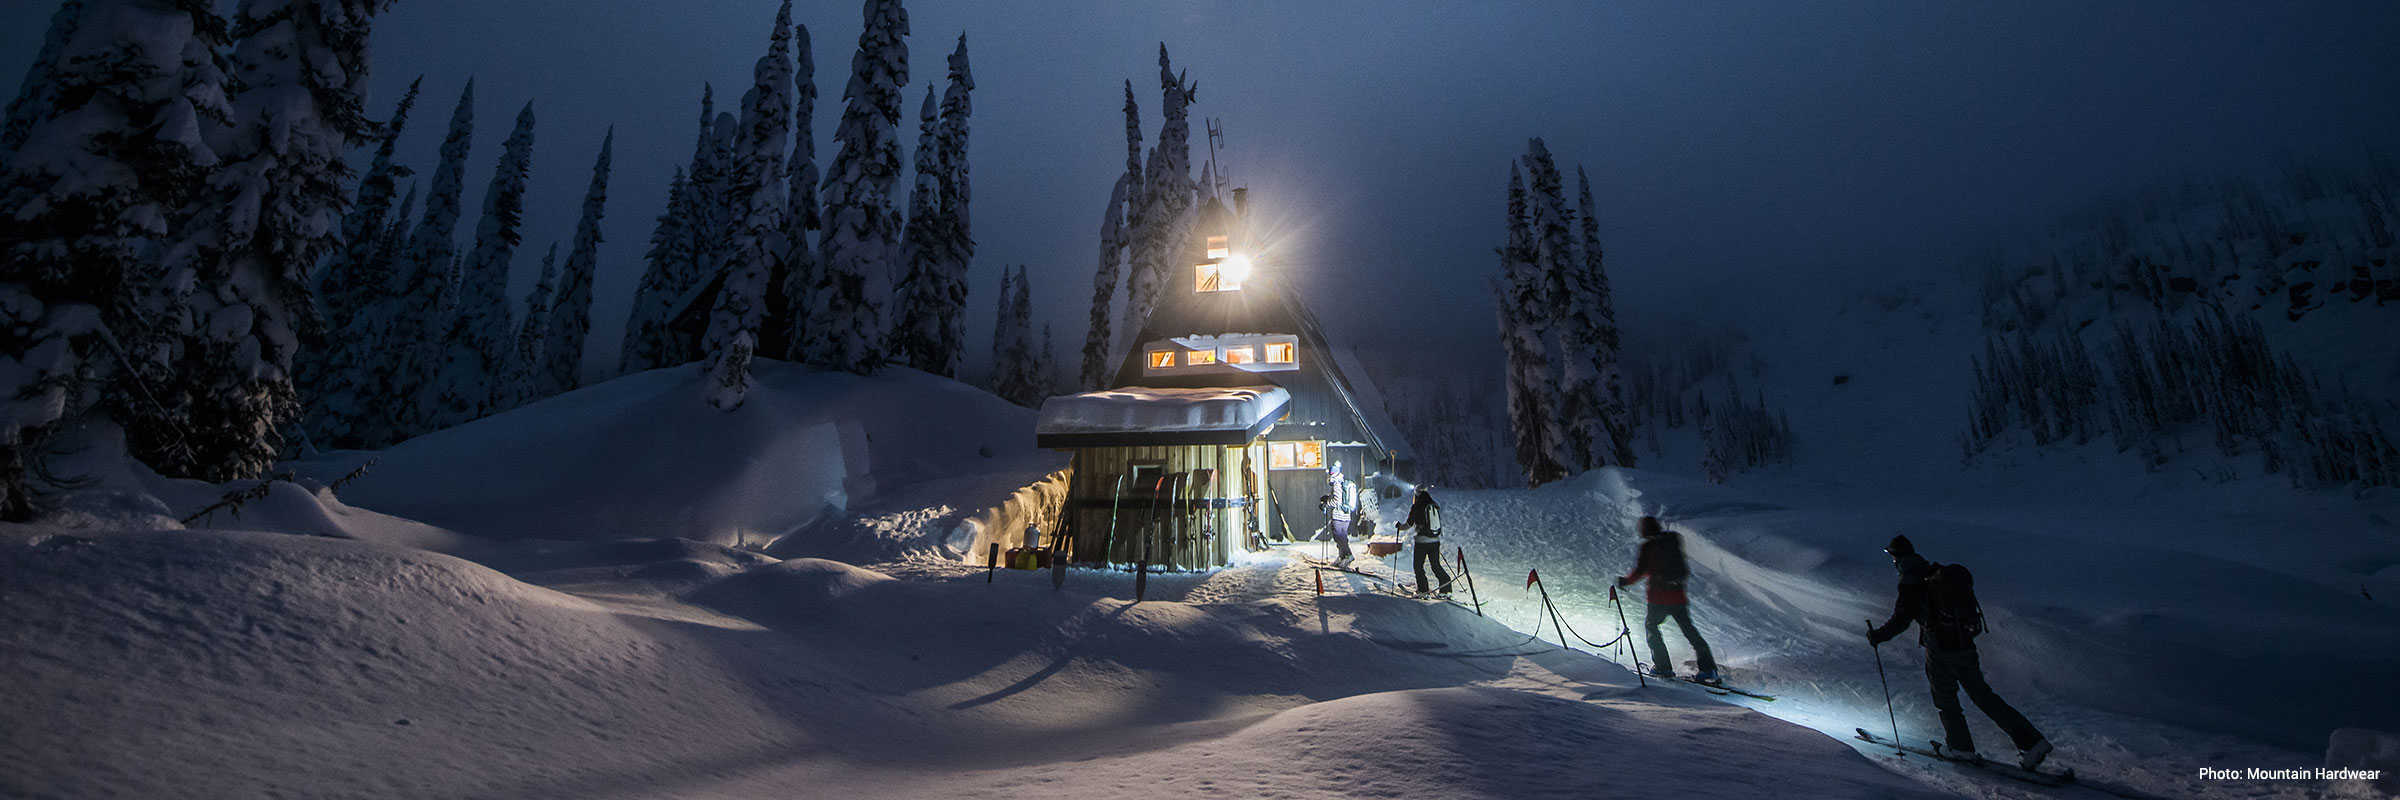 Marmot, Mountain Hardwear, Sea to Summit, Sleeping Bags, The North Face, winter camping, Winter sleeping bags. The 6 Best Winter Sleeping Bags for Camping Adventures